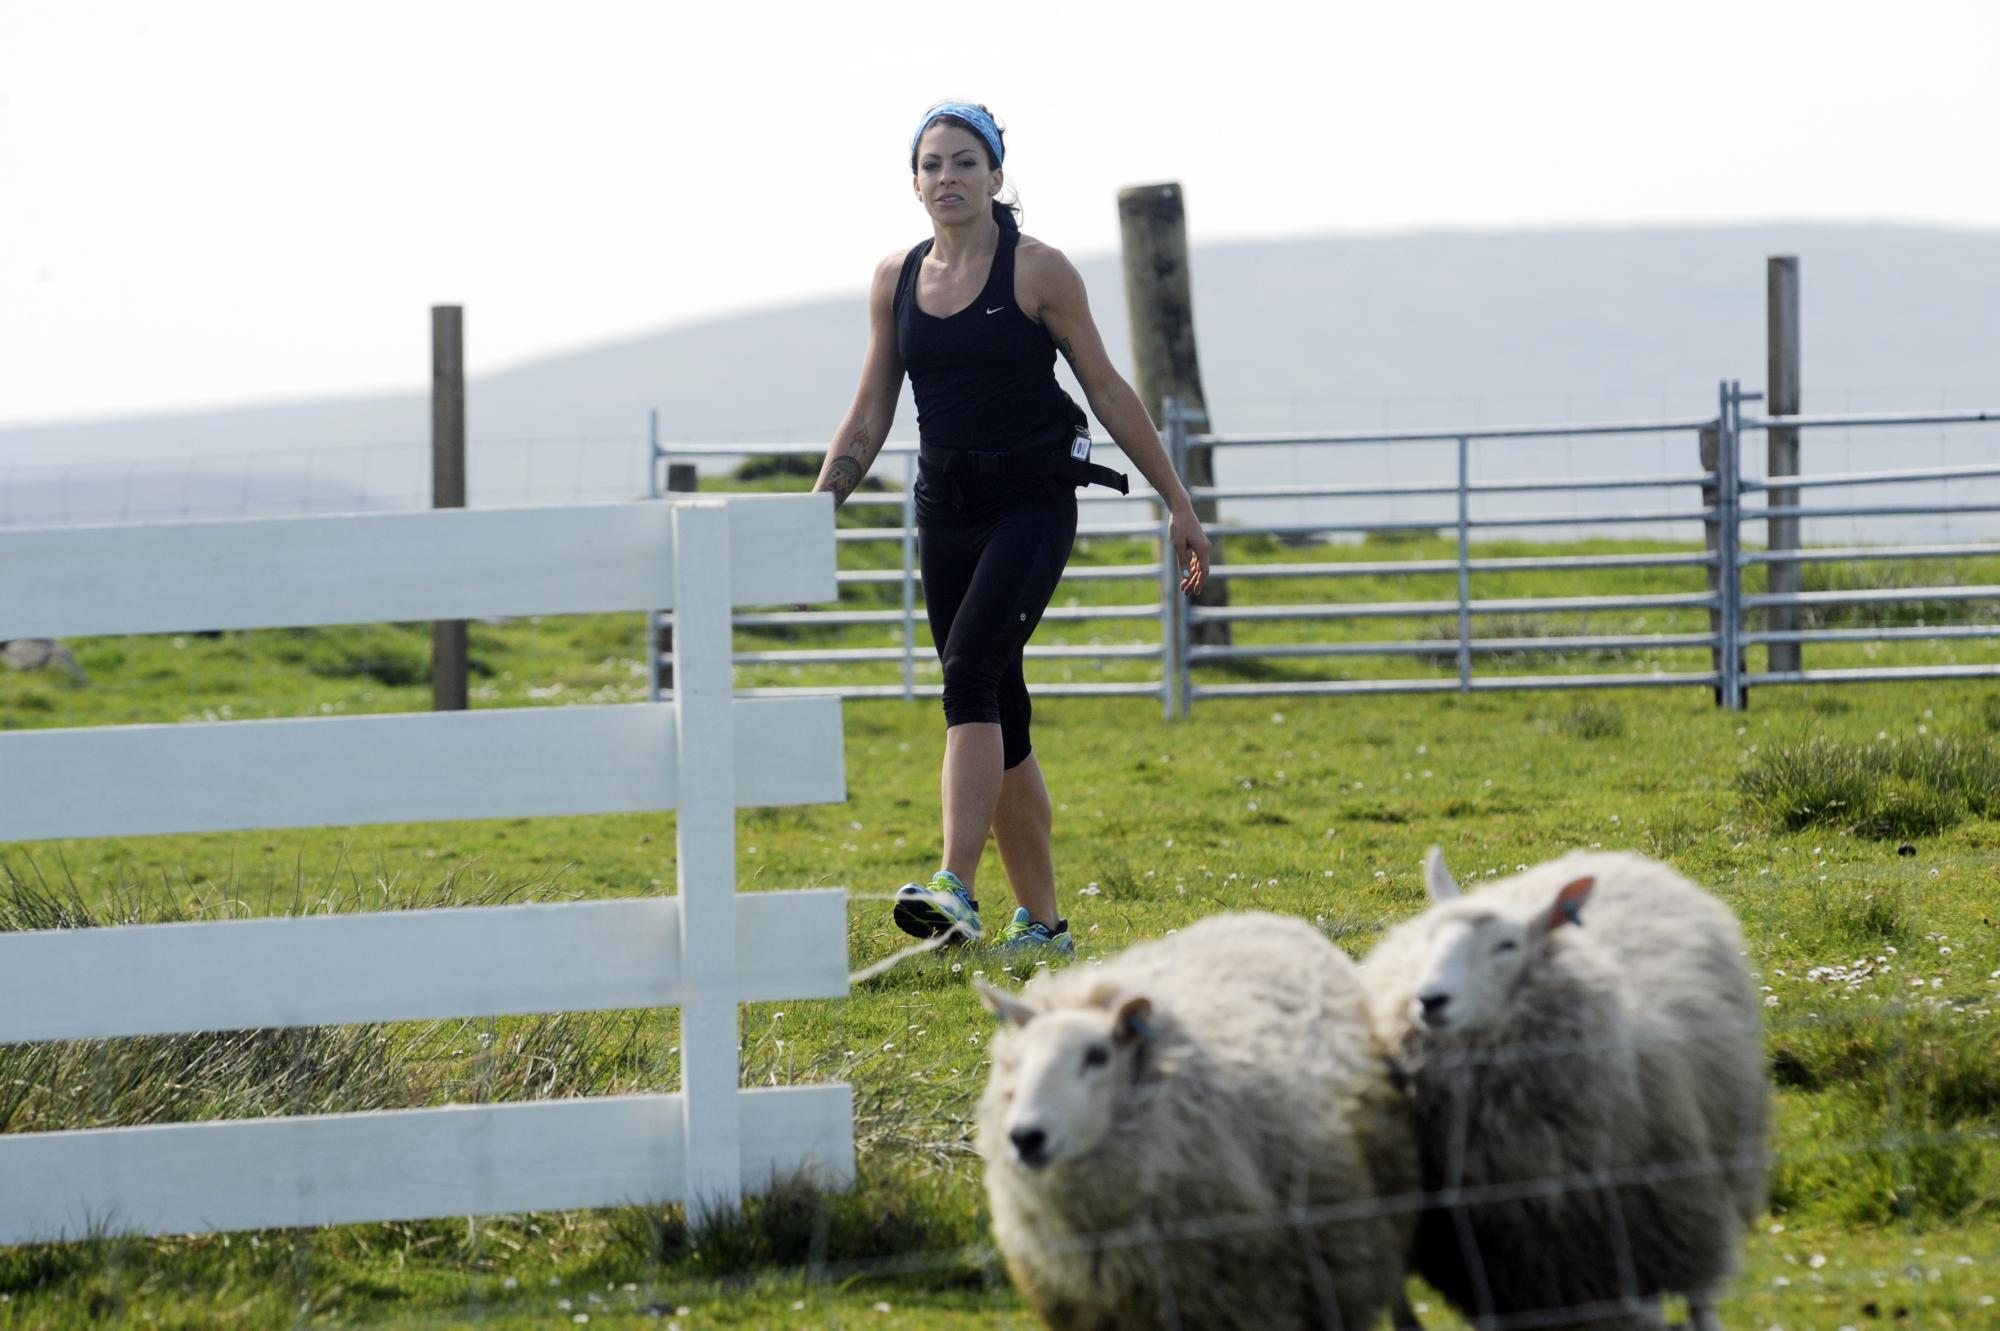 Kym herds sheep